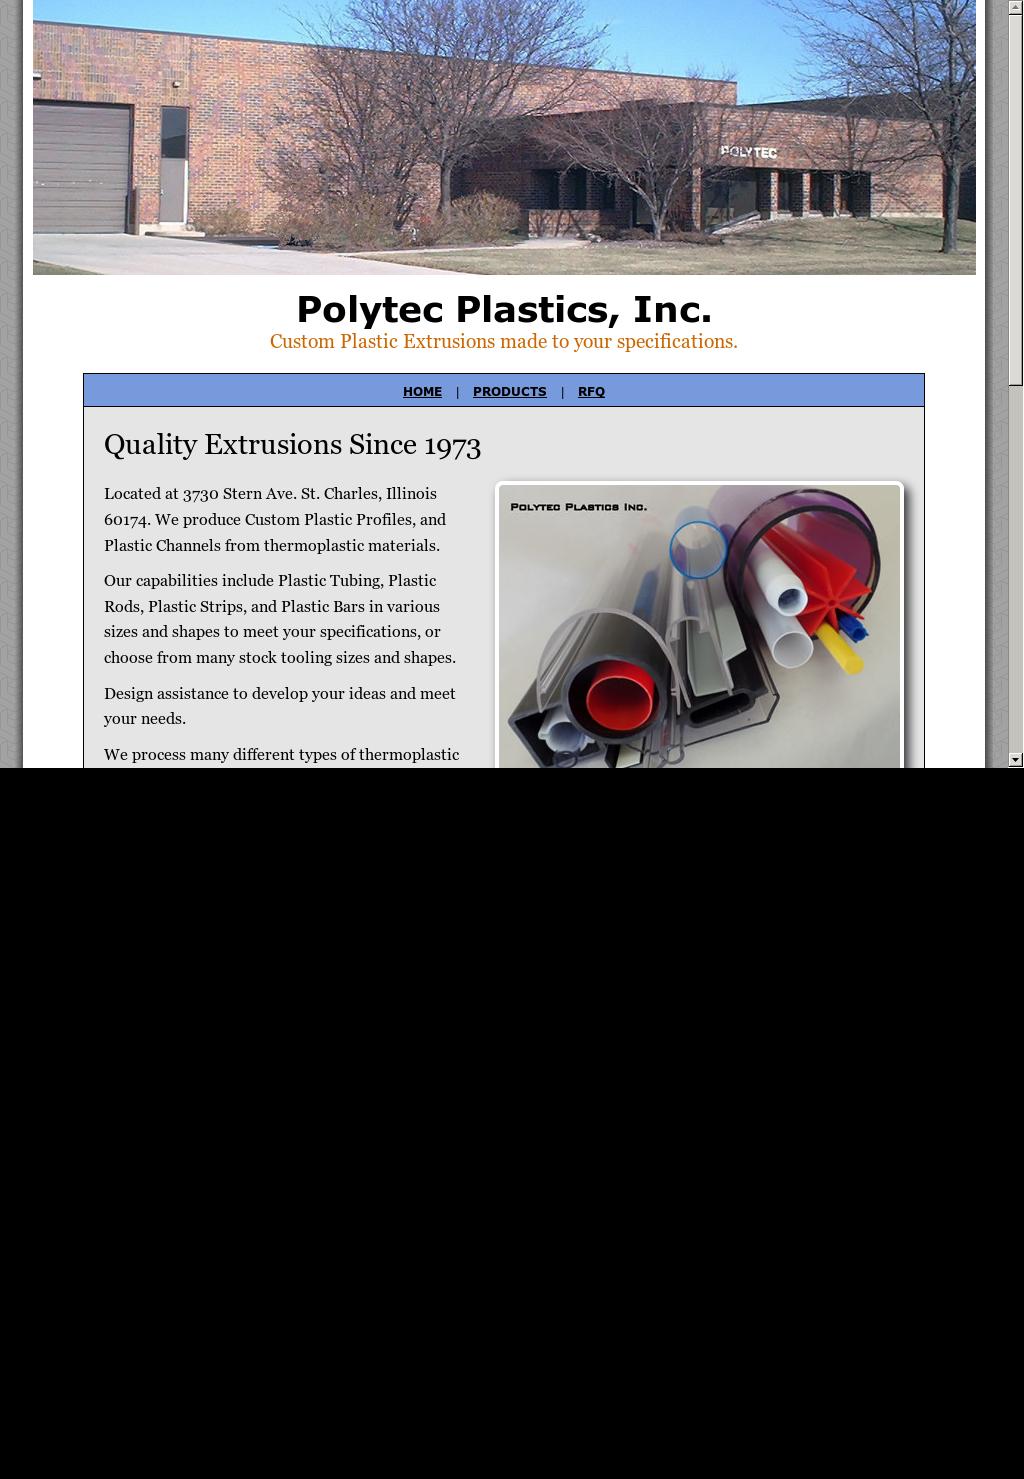 Polytec Plastics Competitors, Revenue and Employees - Owler